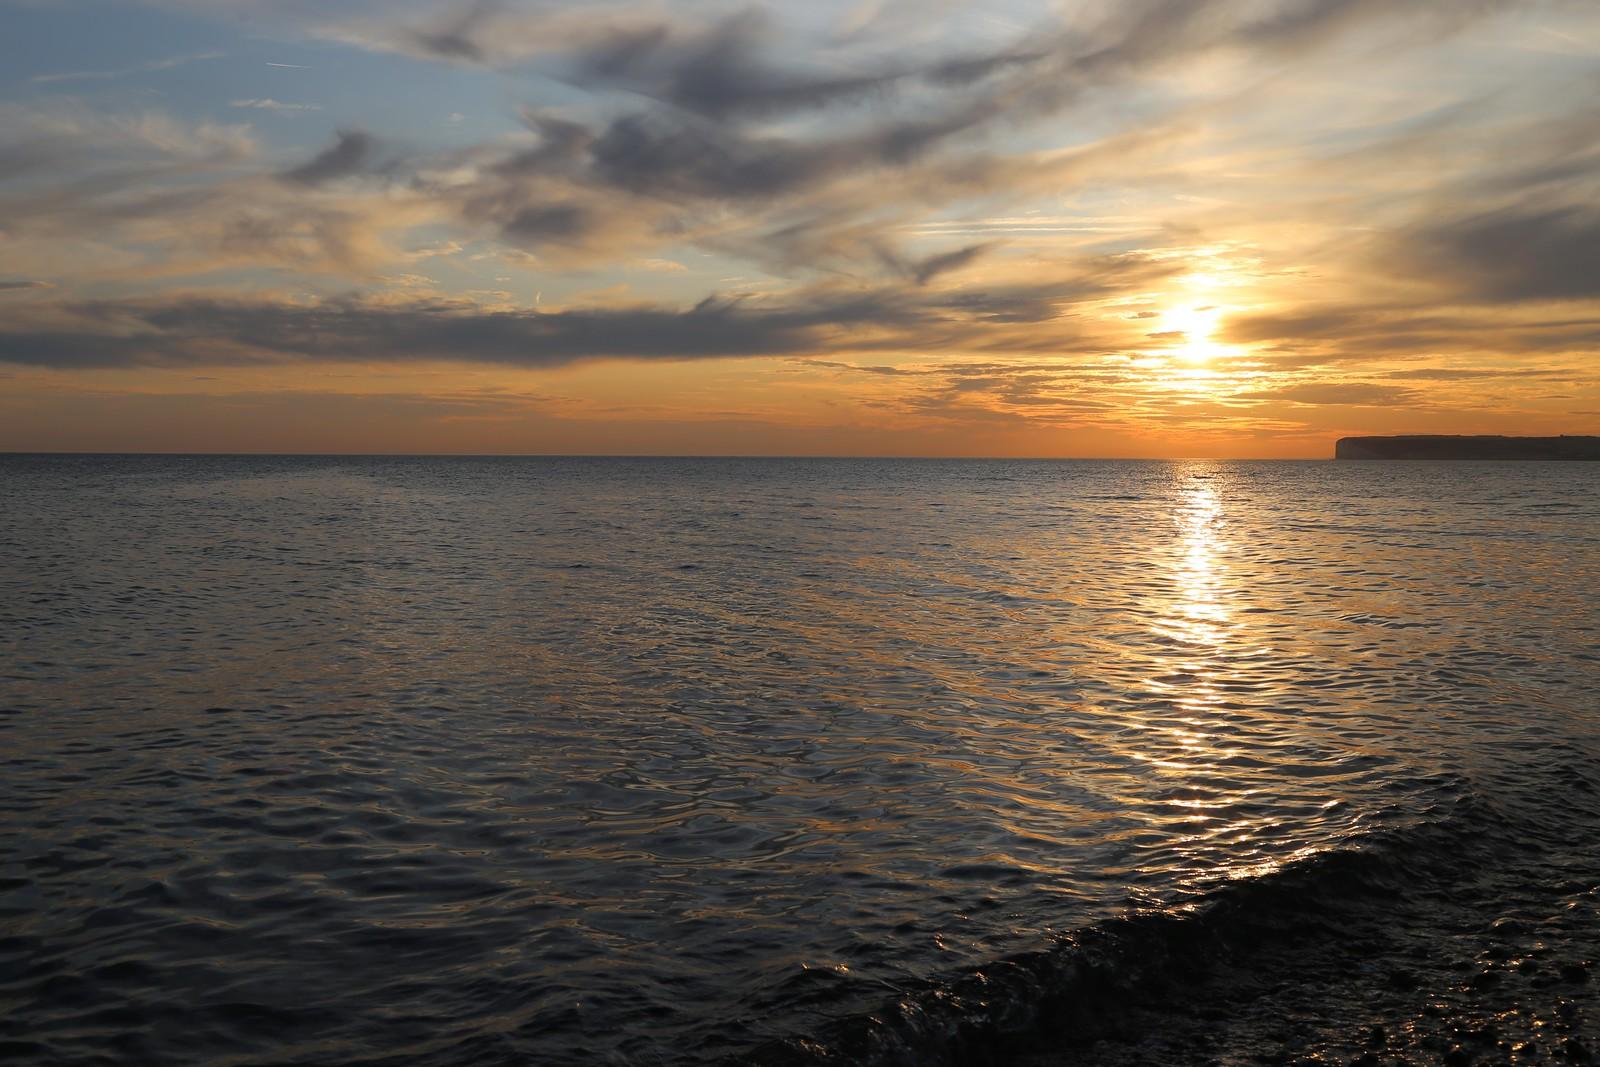 Sun going down - Birling Gap